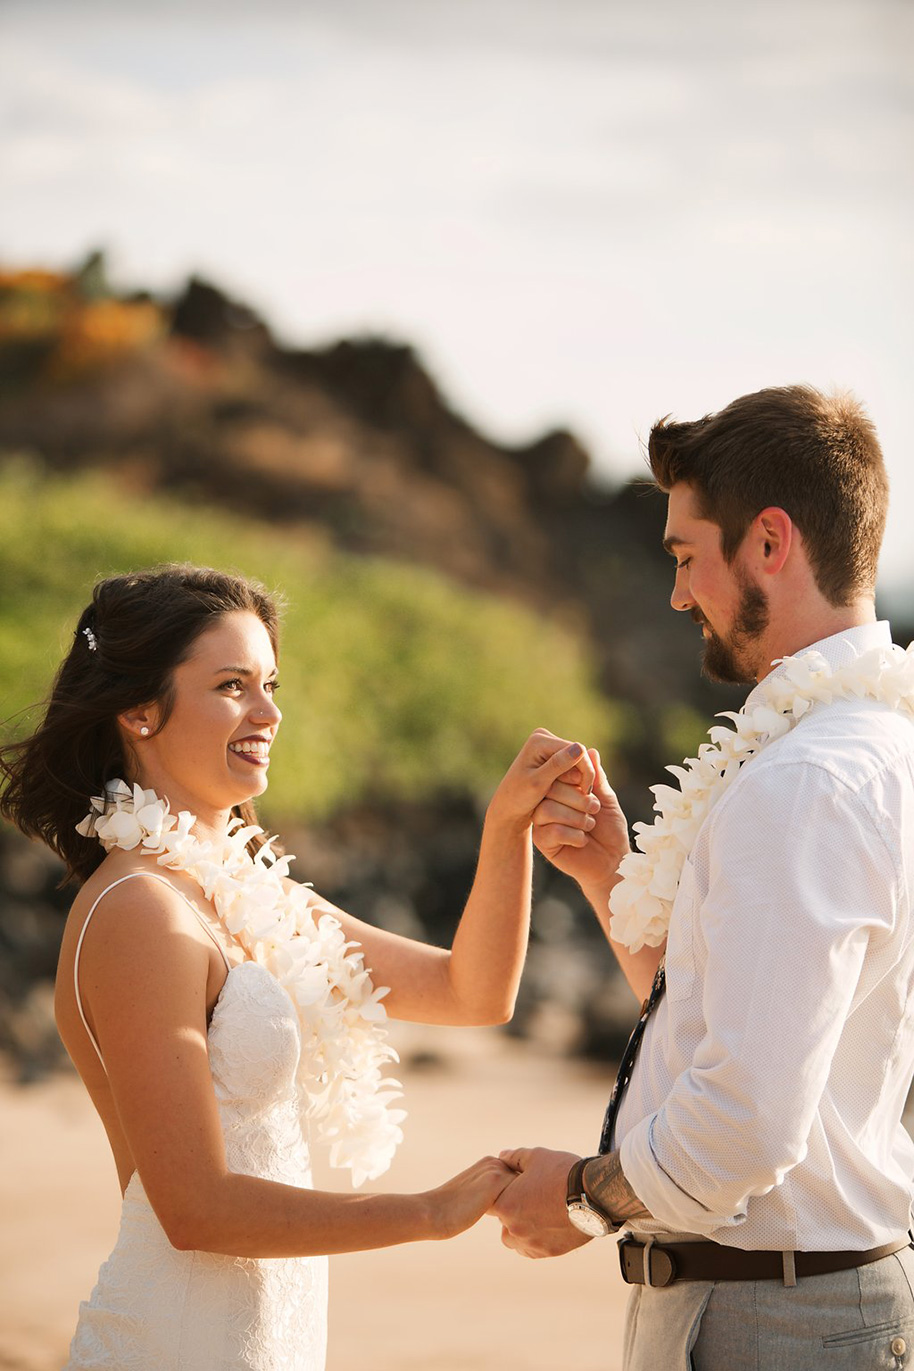 Maui-Beach-Wedding-070616-12.jpg